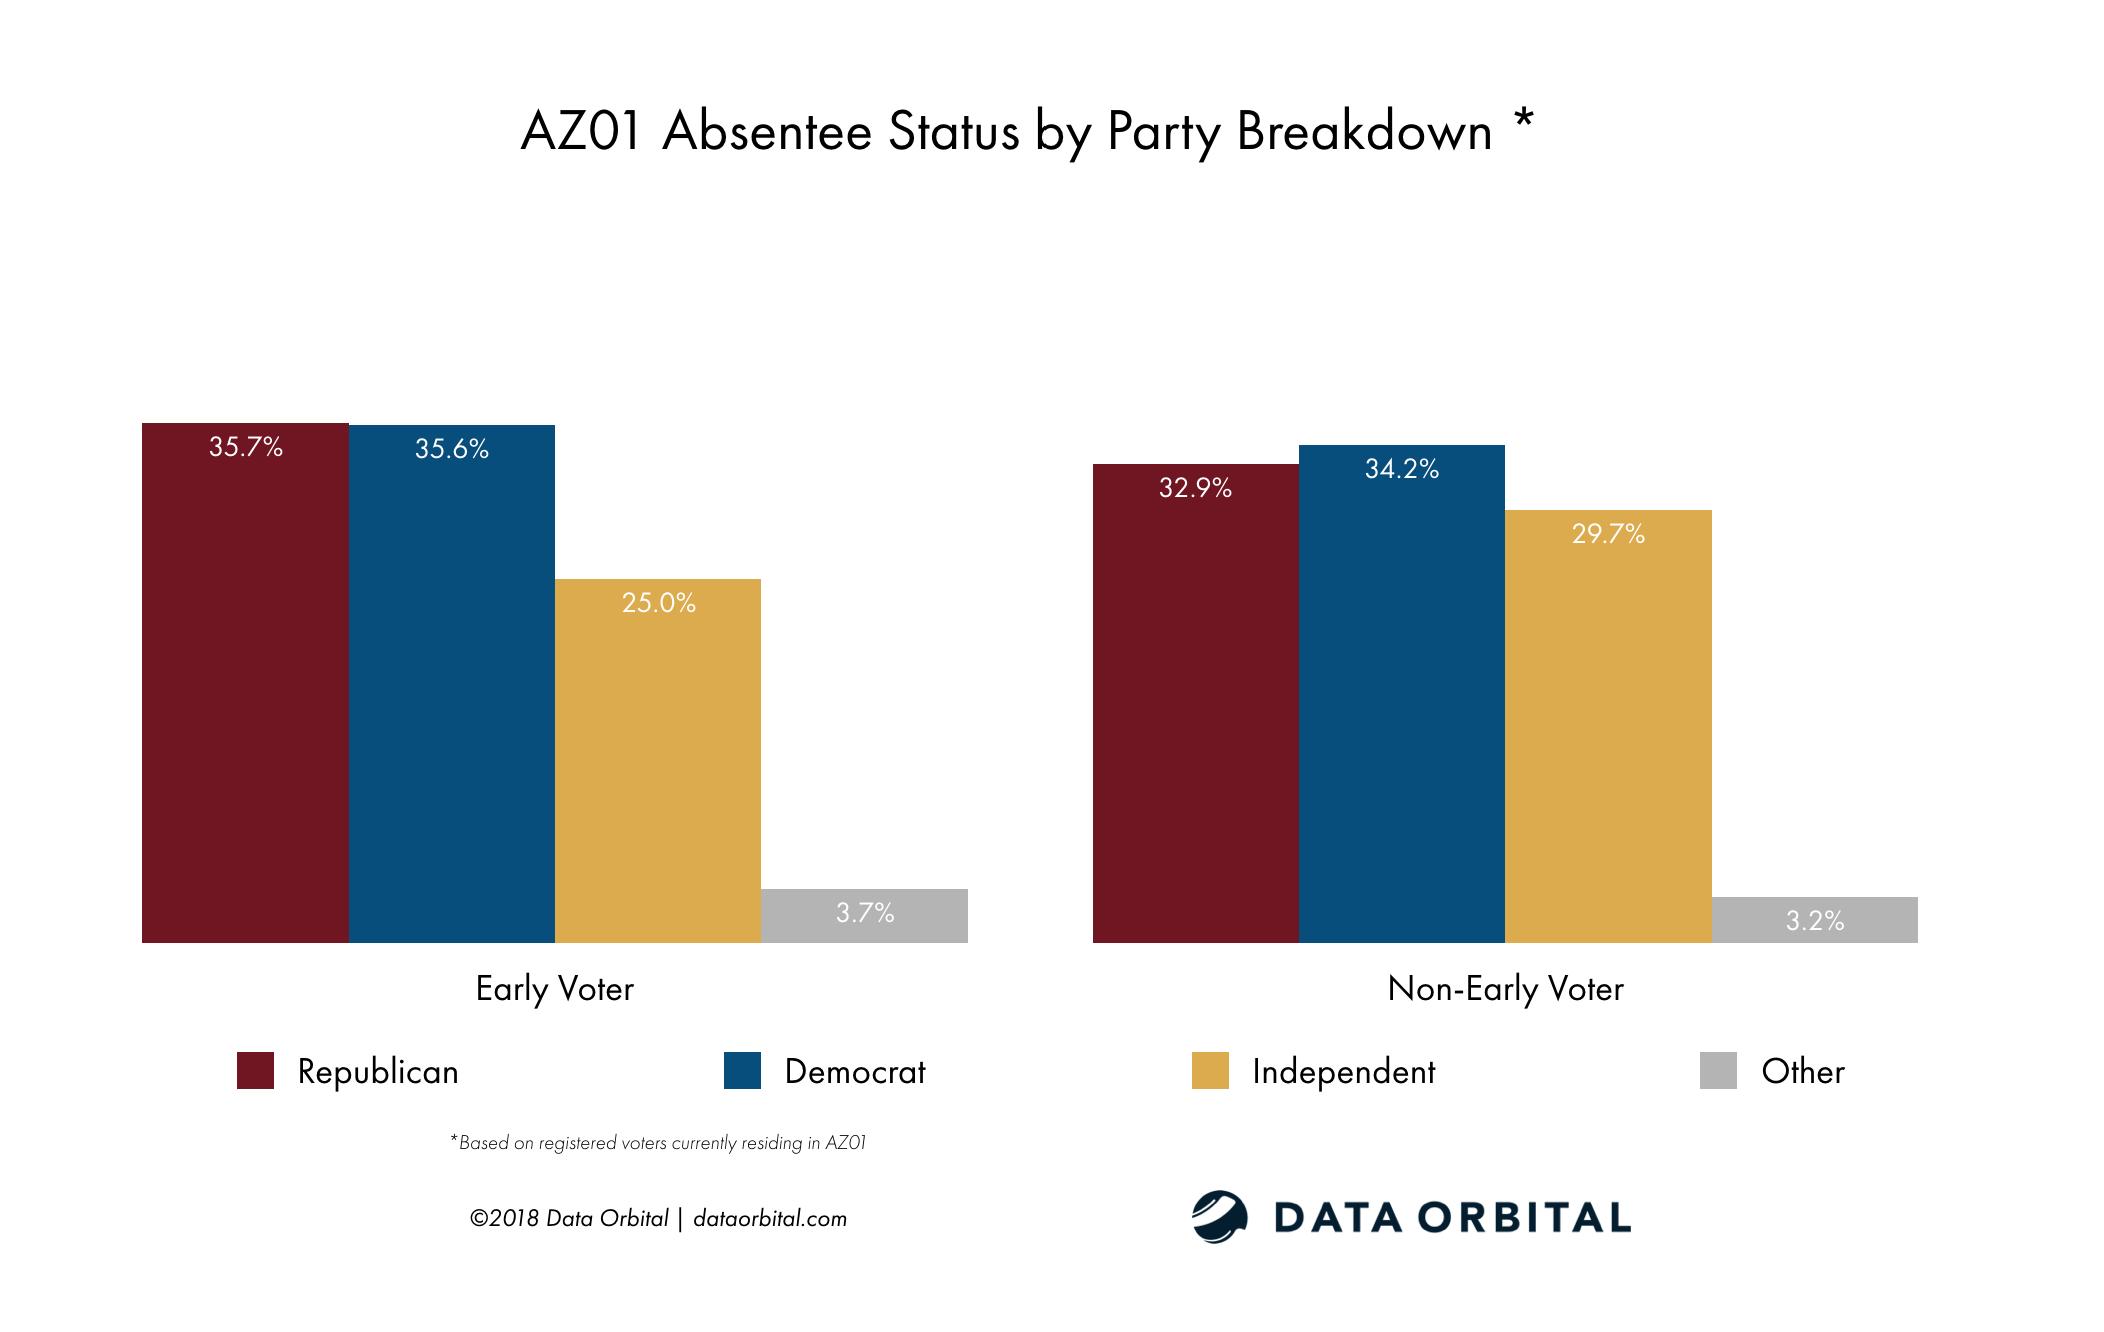 AZ01 District Profile Absentee Status by Party Breakdown